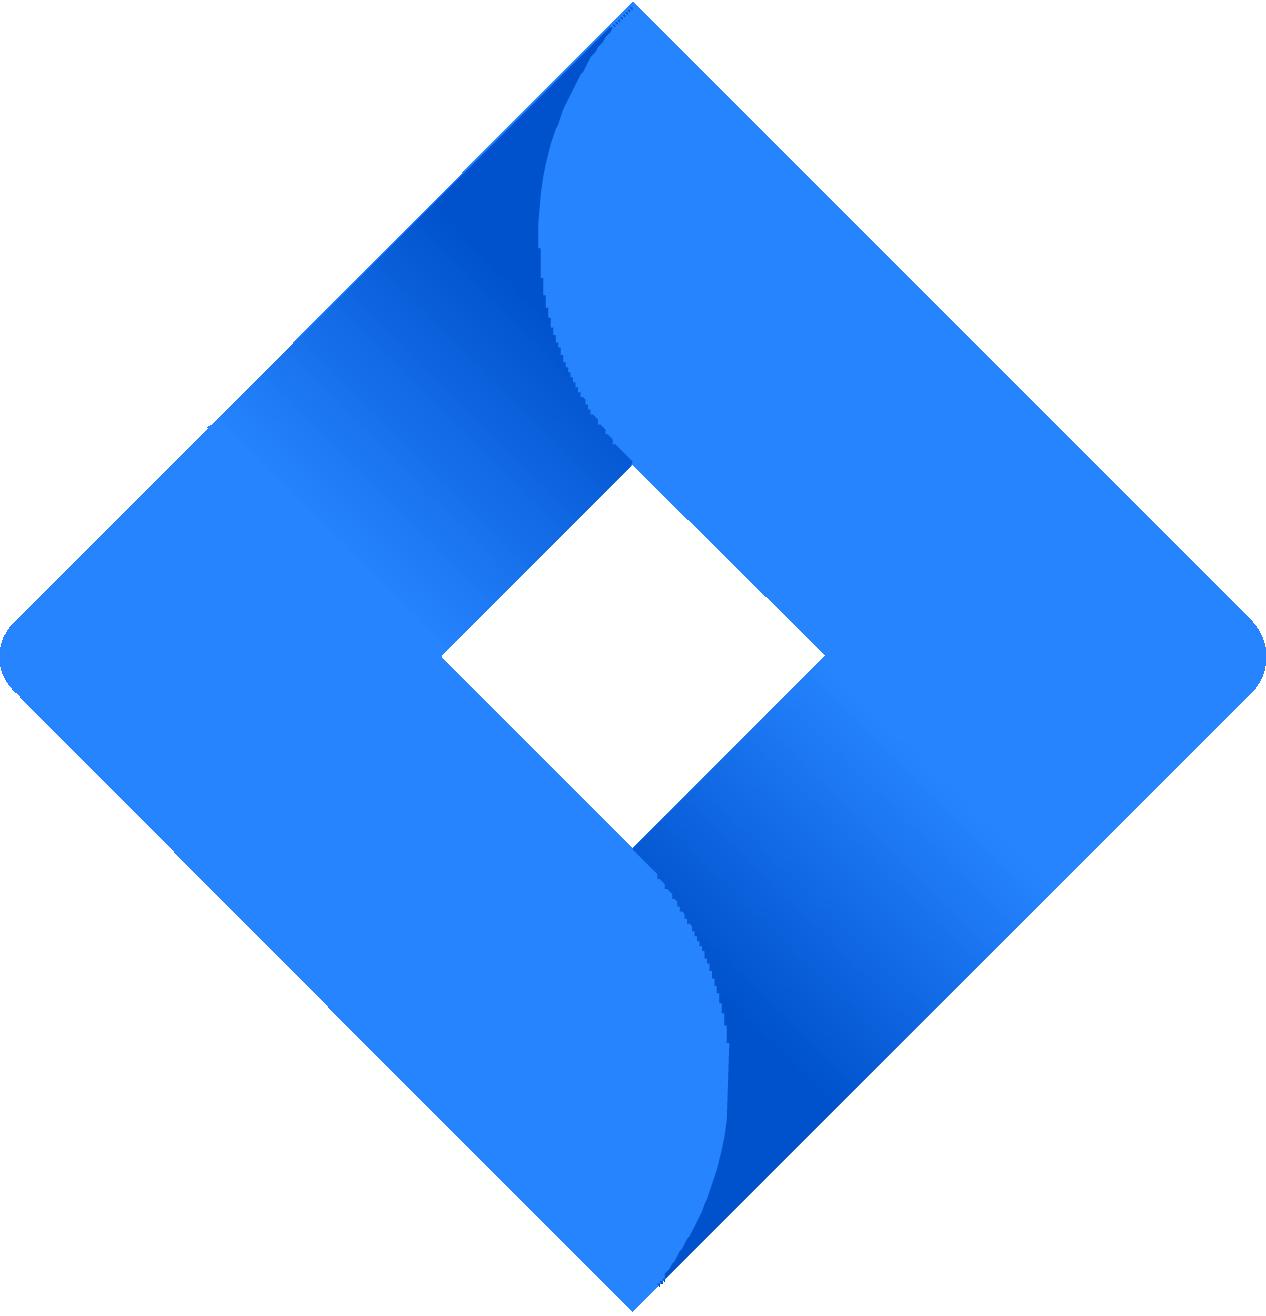 Jira icon clipart jpg freeuse download Jira Logo Vector Icon Template Clipart Free Download jpg freeuse download